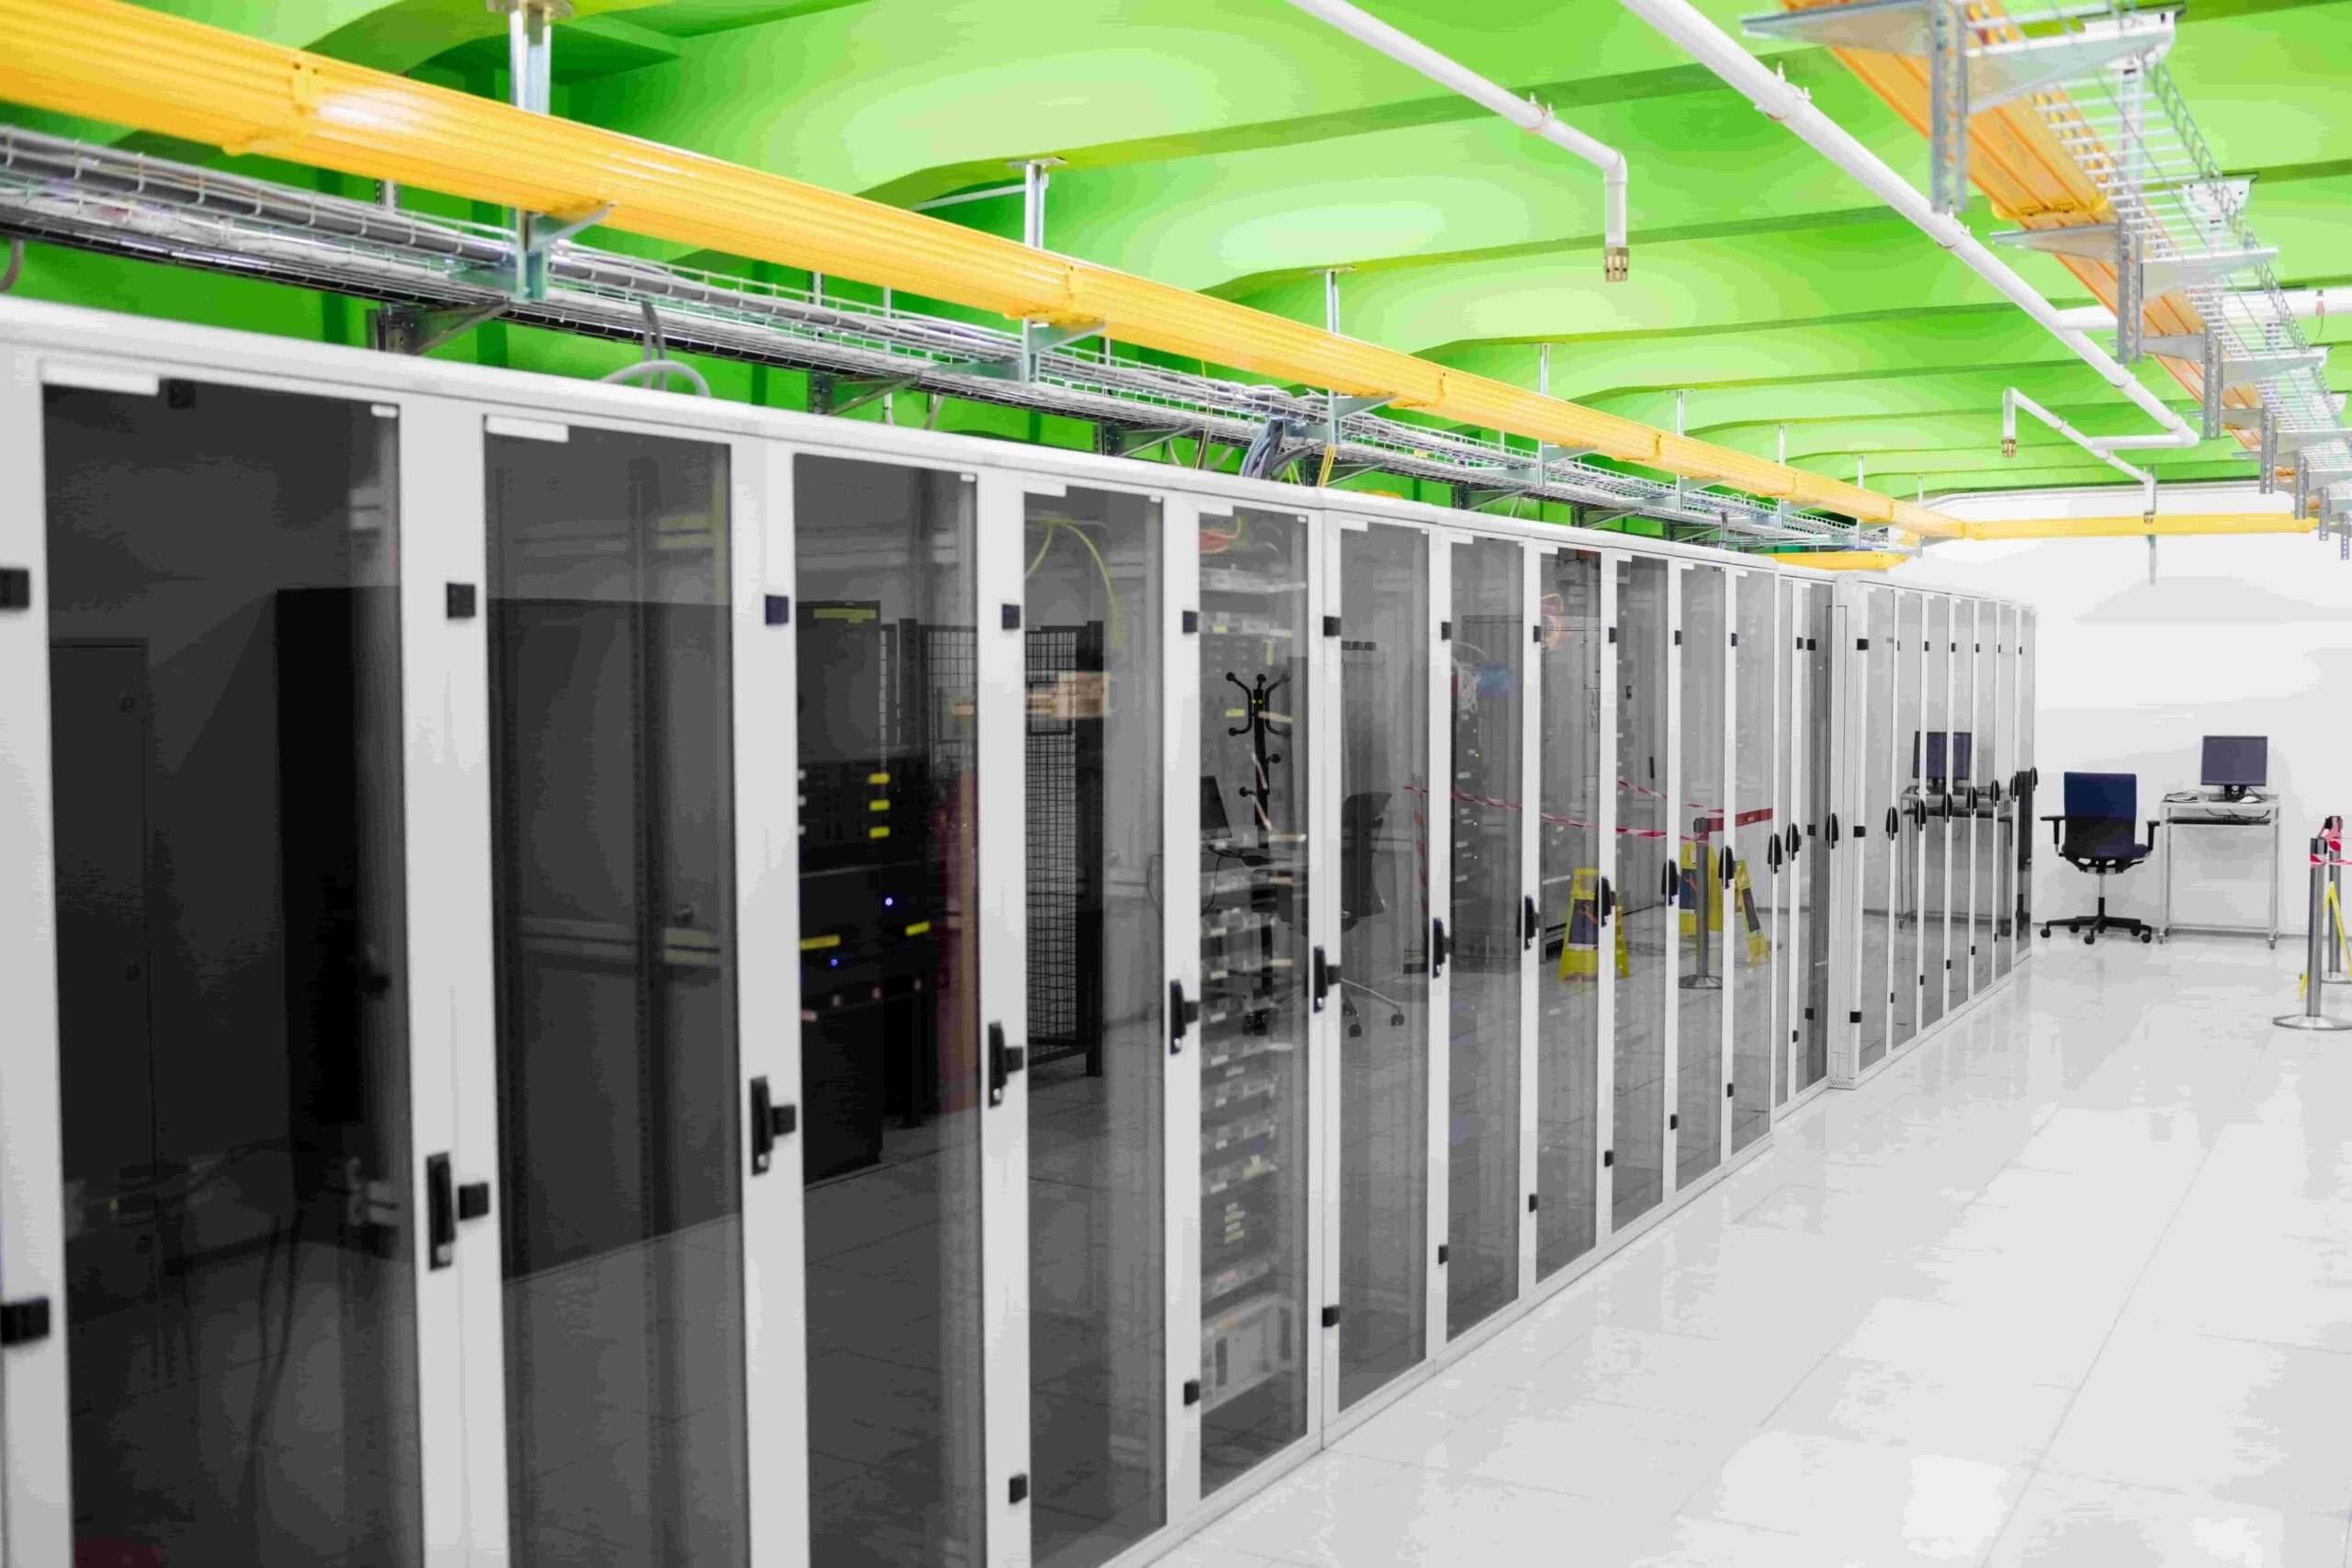 dinets_data center01